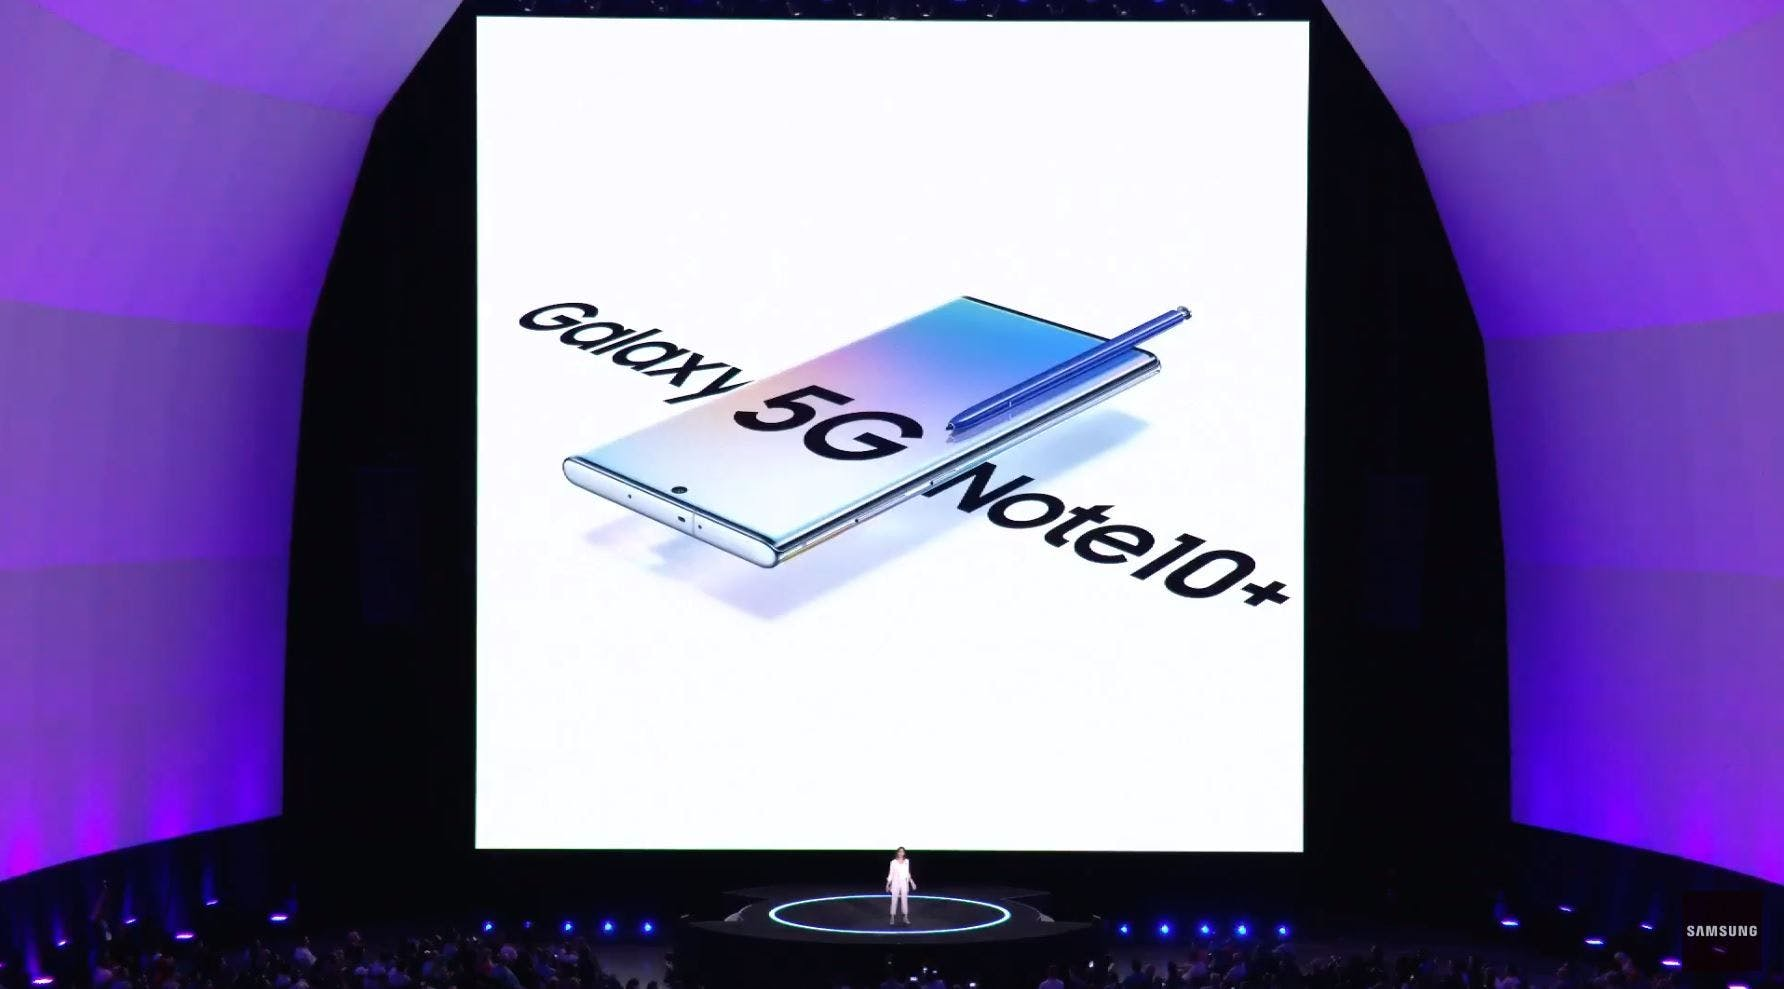 Samsung's Unpacked Event August 2019 Source: Samsung